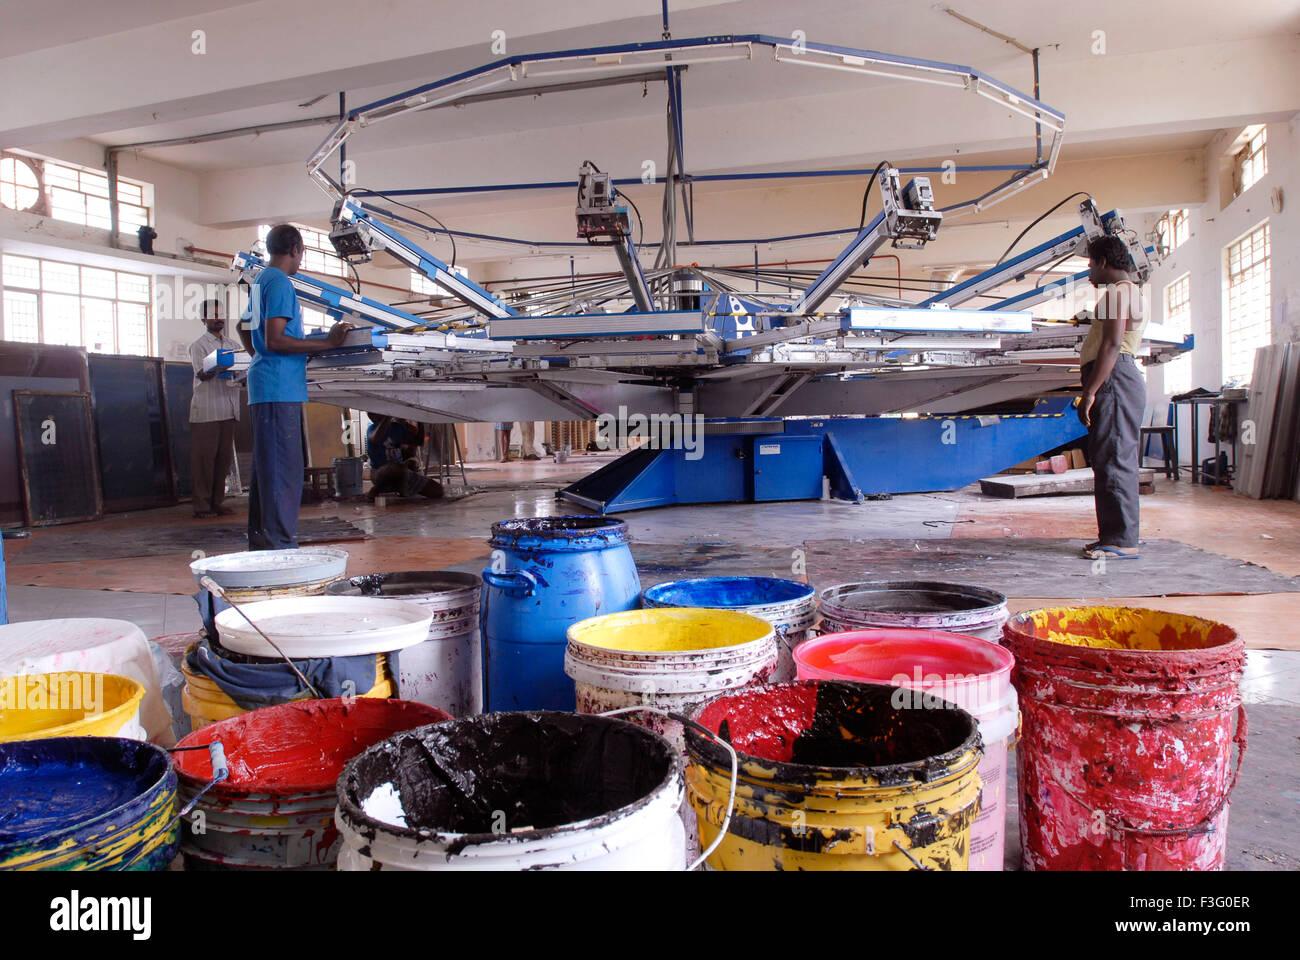 Fabric Printing Factory Stock Photos & Fabric Printing Factory Stock